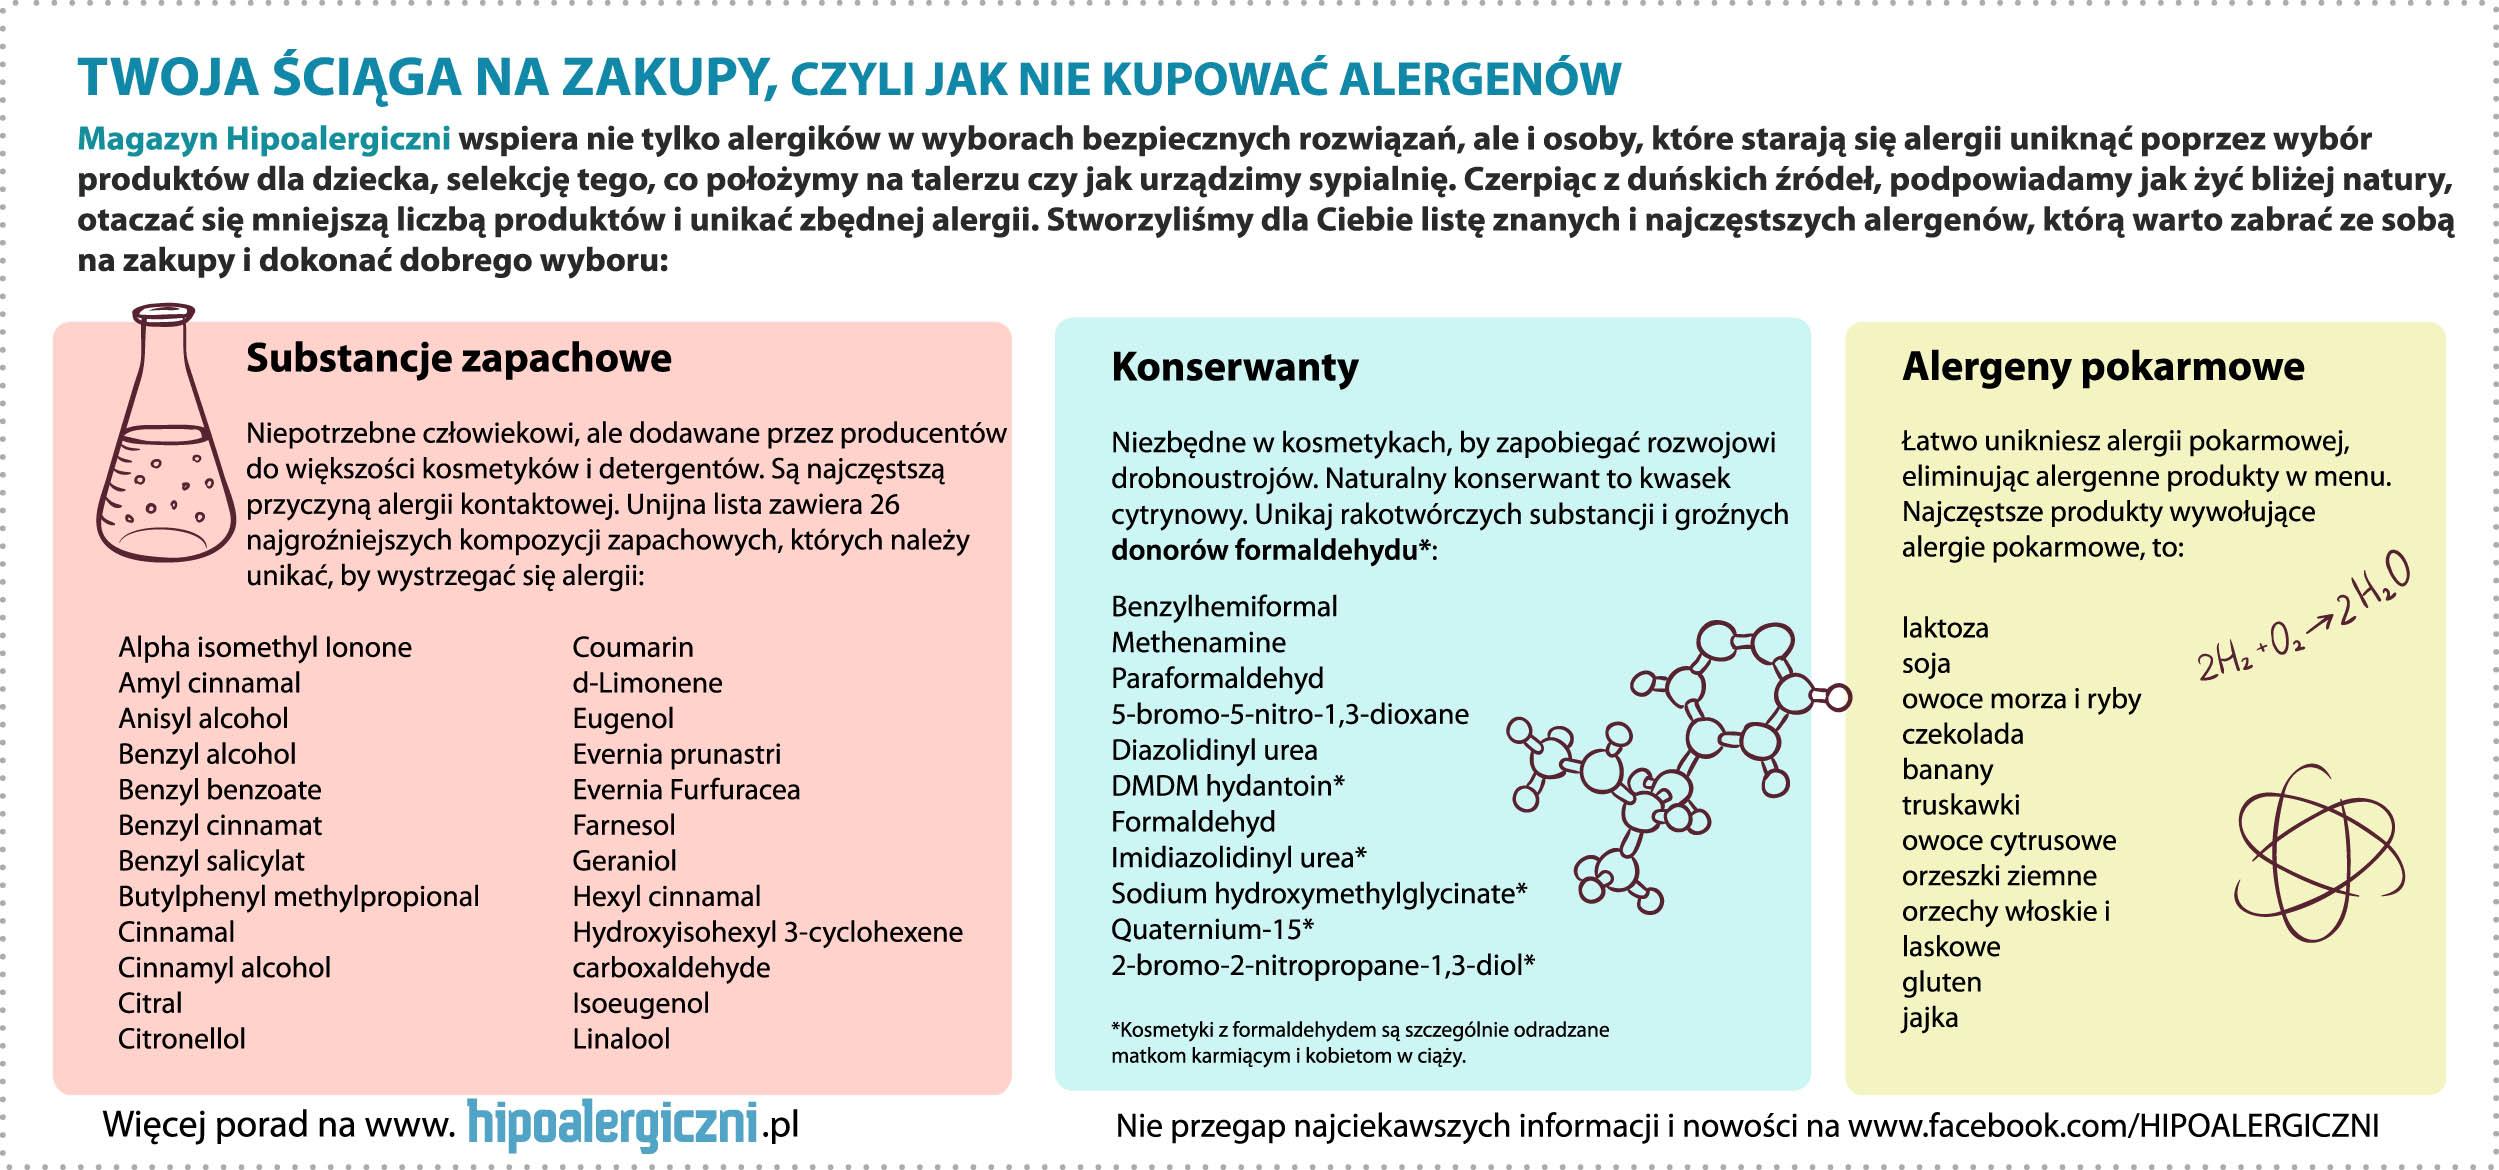 hipoalergiczni-ulotka-05.2014-A